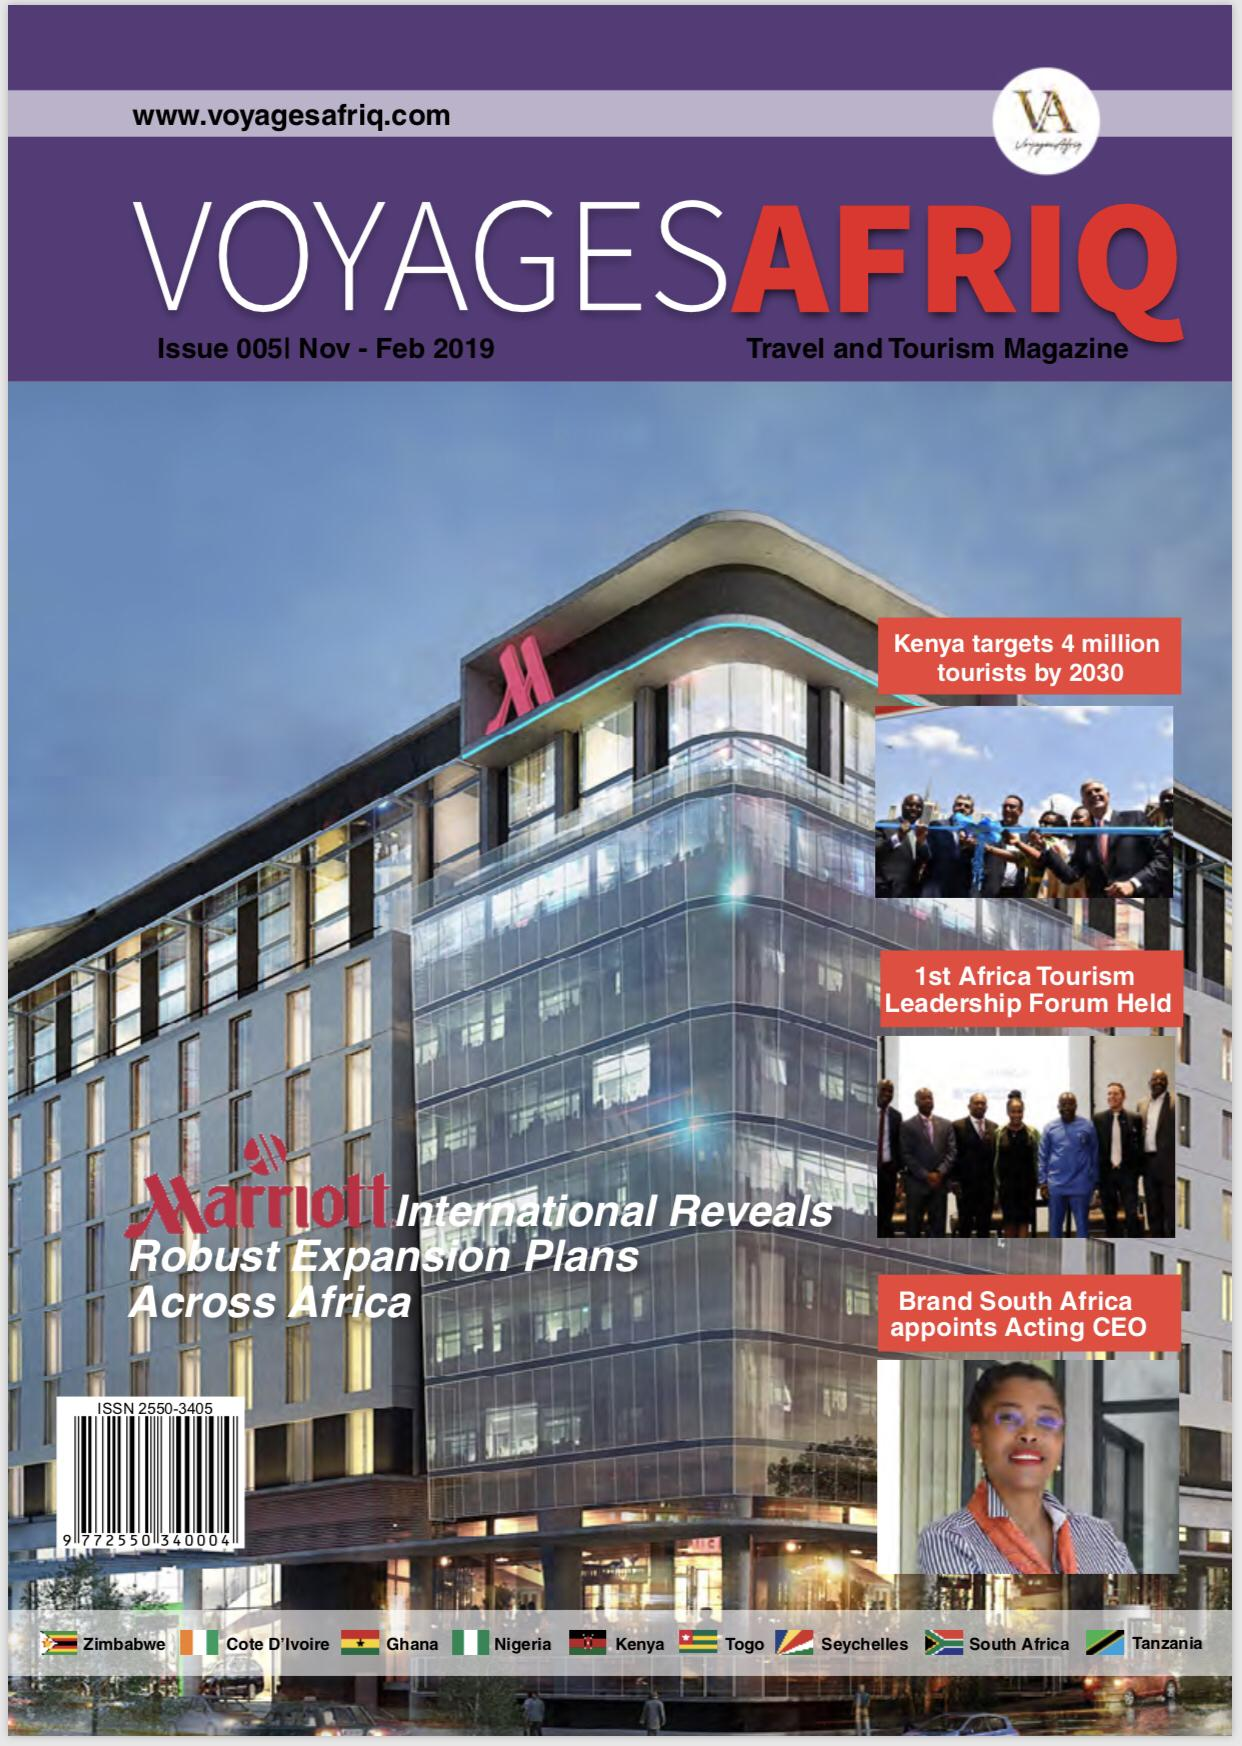 November edition of VoyagesAfriq Travel Magazine is out!